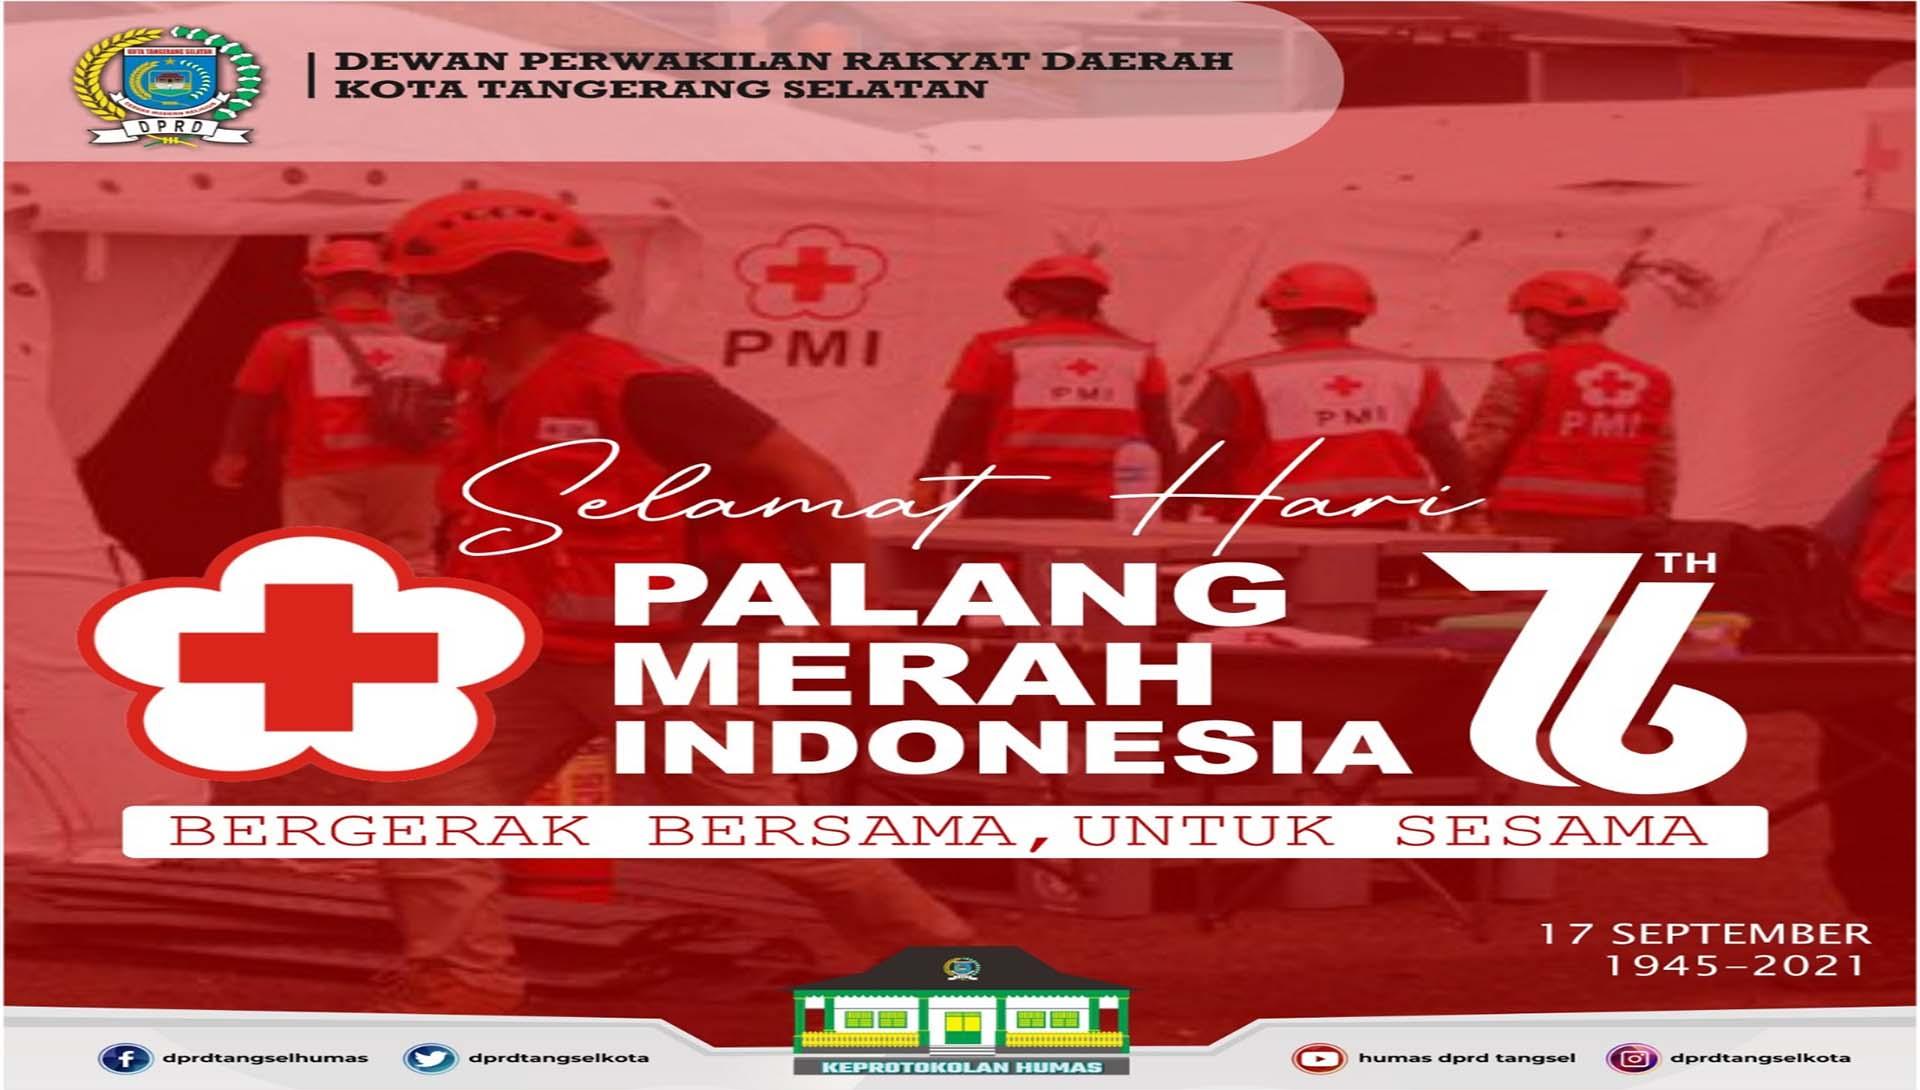 Selamat Hari Palang Merah Indonesia ke-76